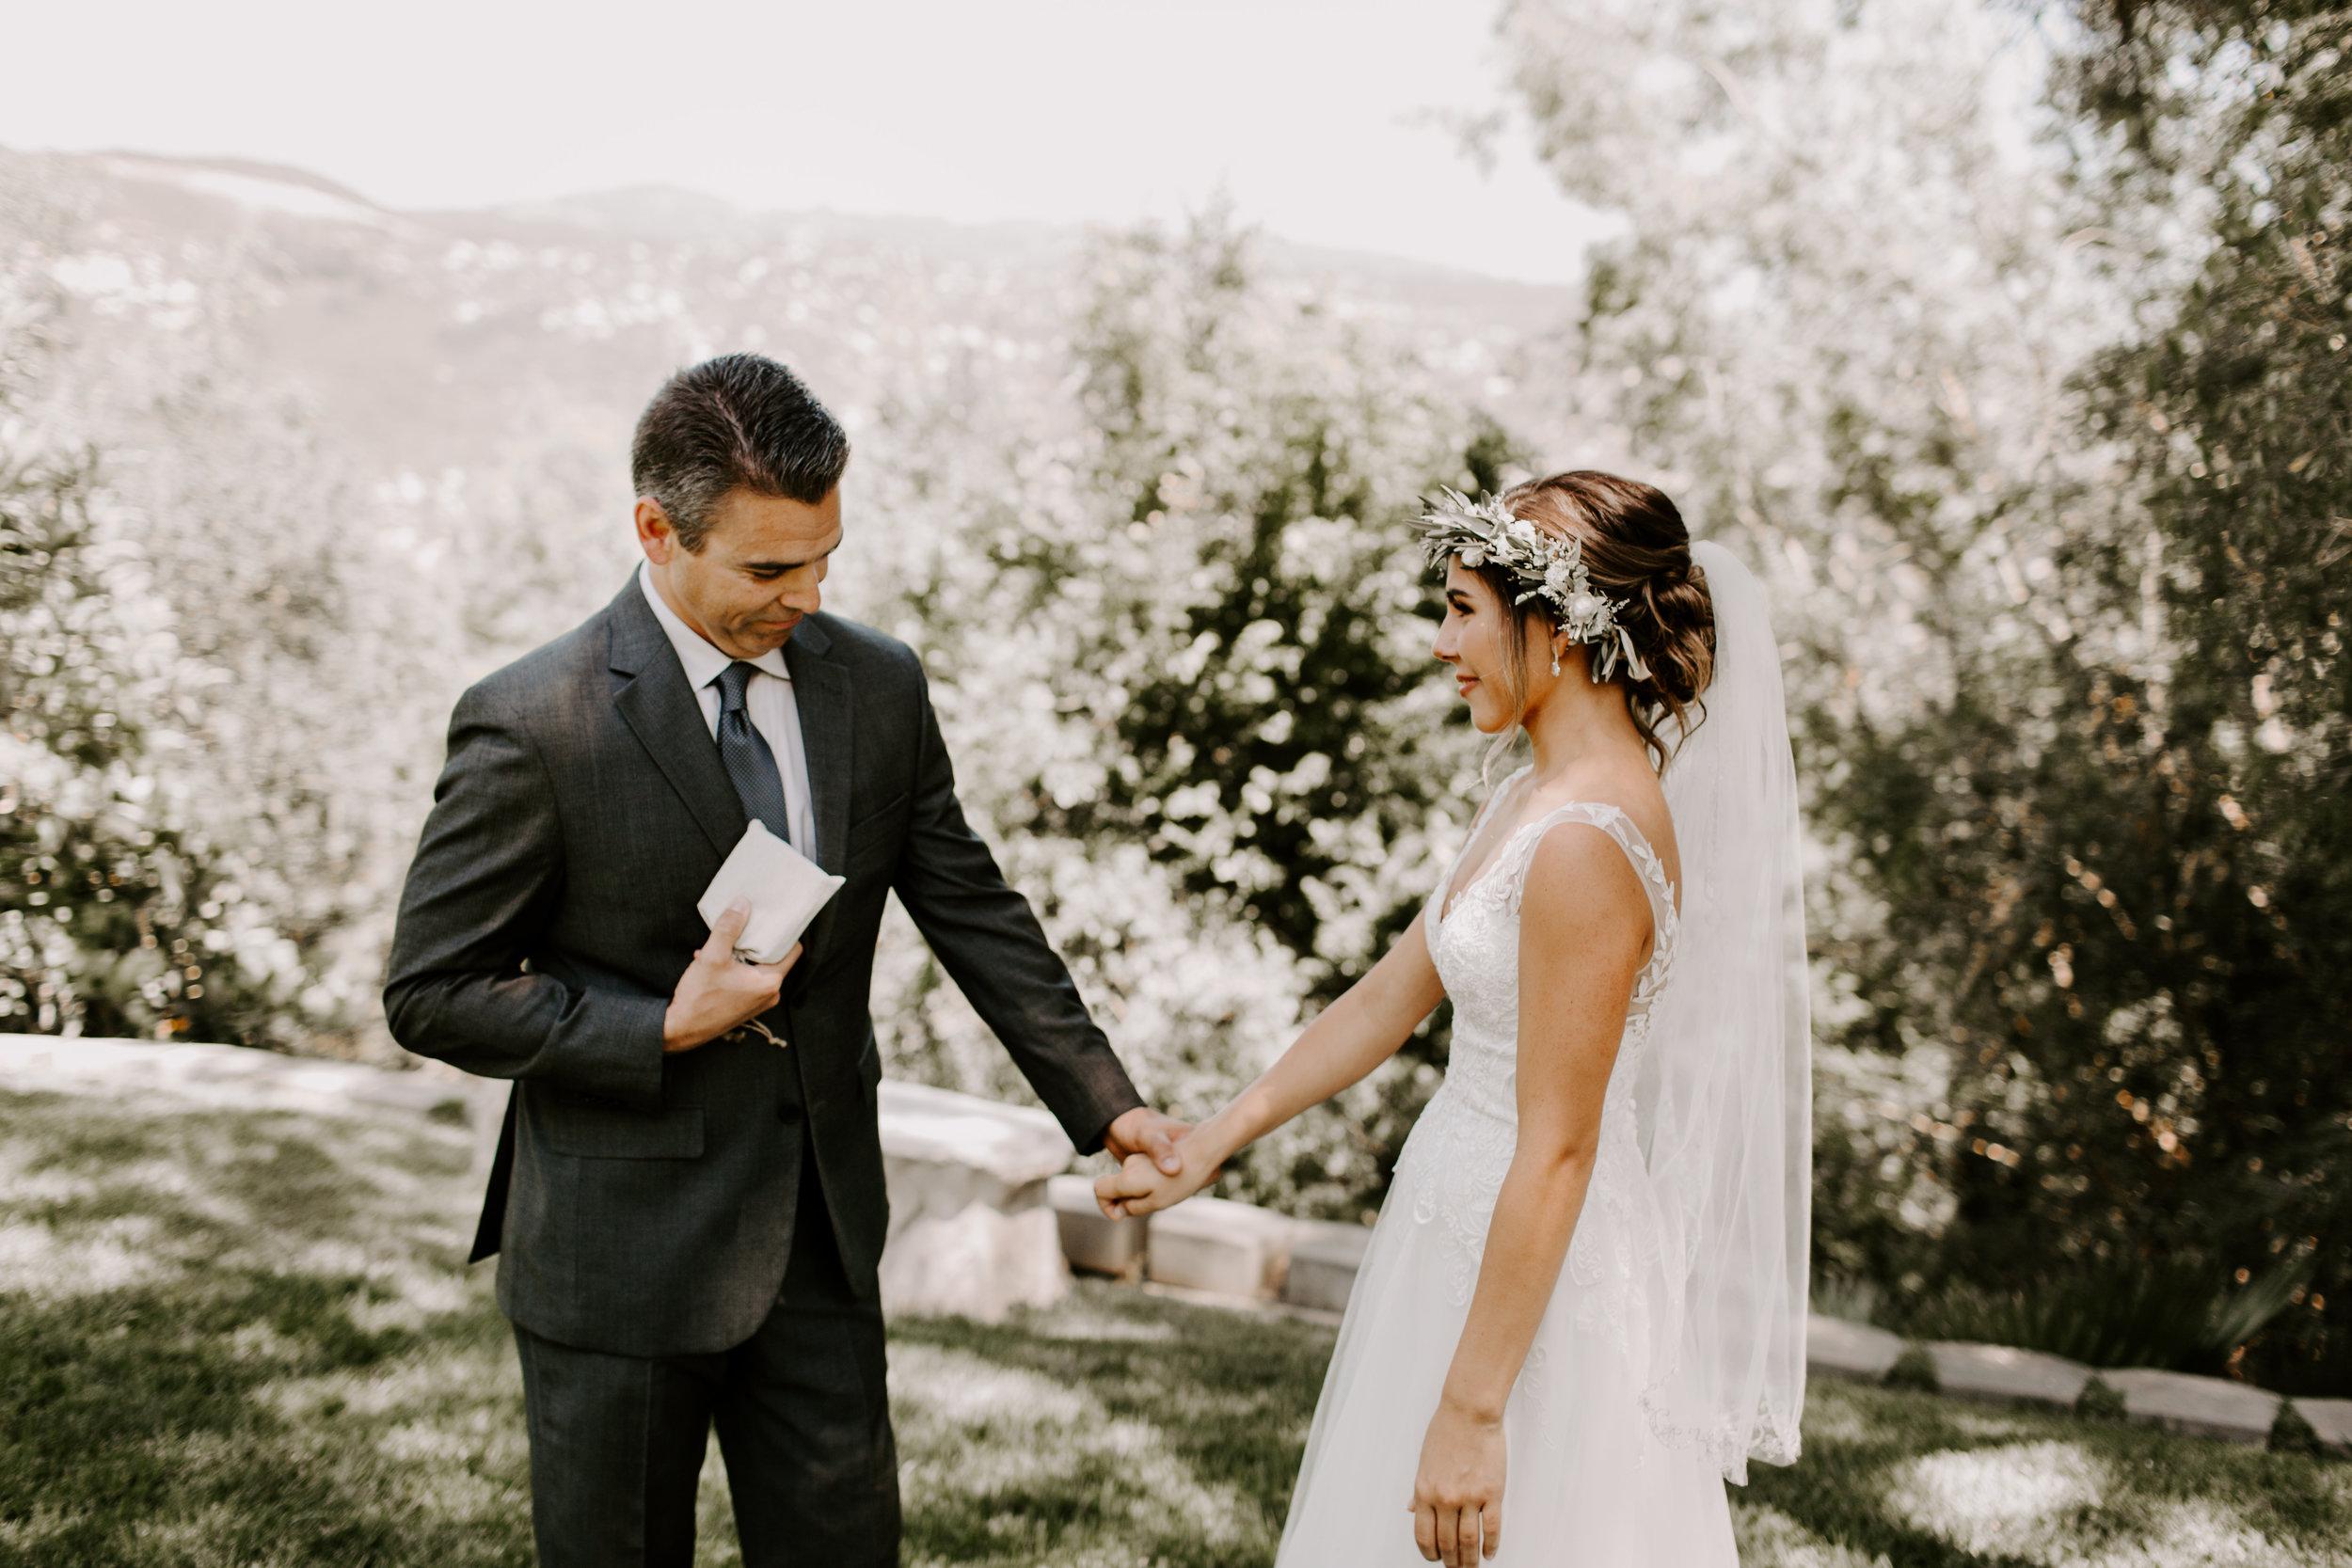 kate+zack_wedding_secludedgardenestate_temecula_madisonrylee_0147.jpg